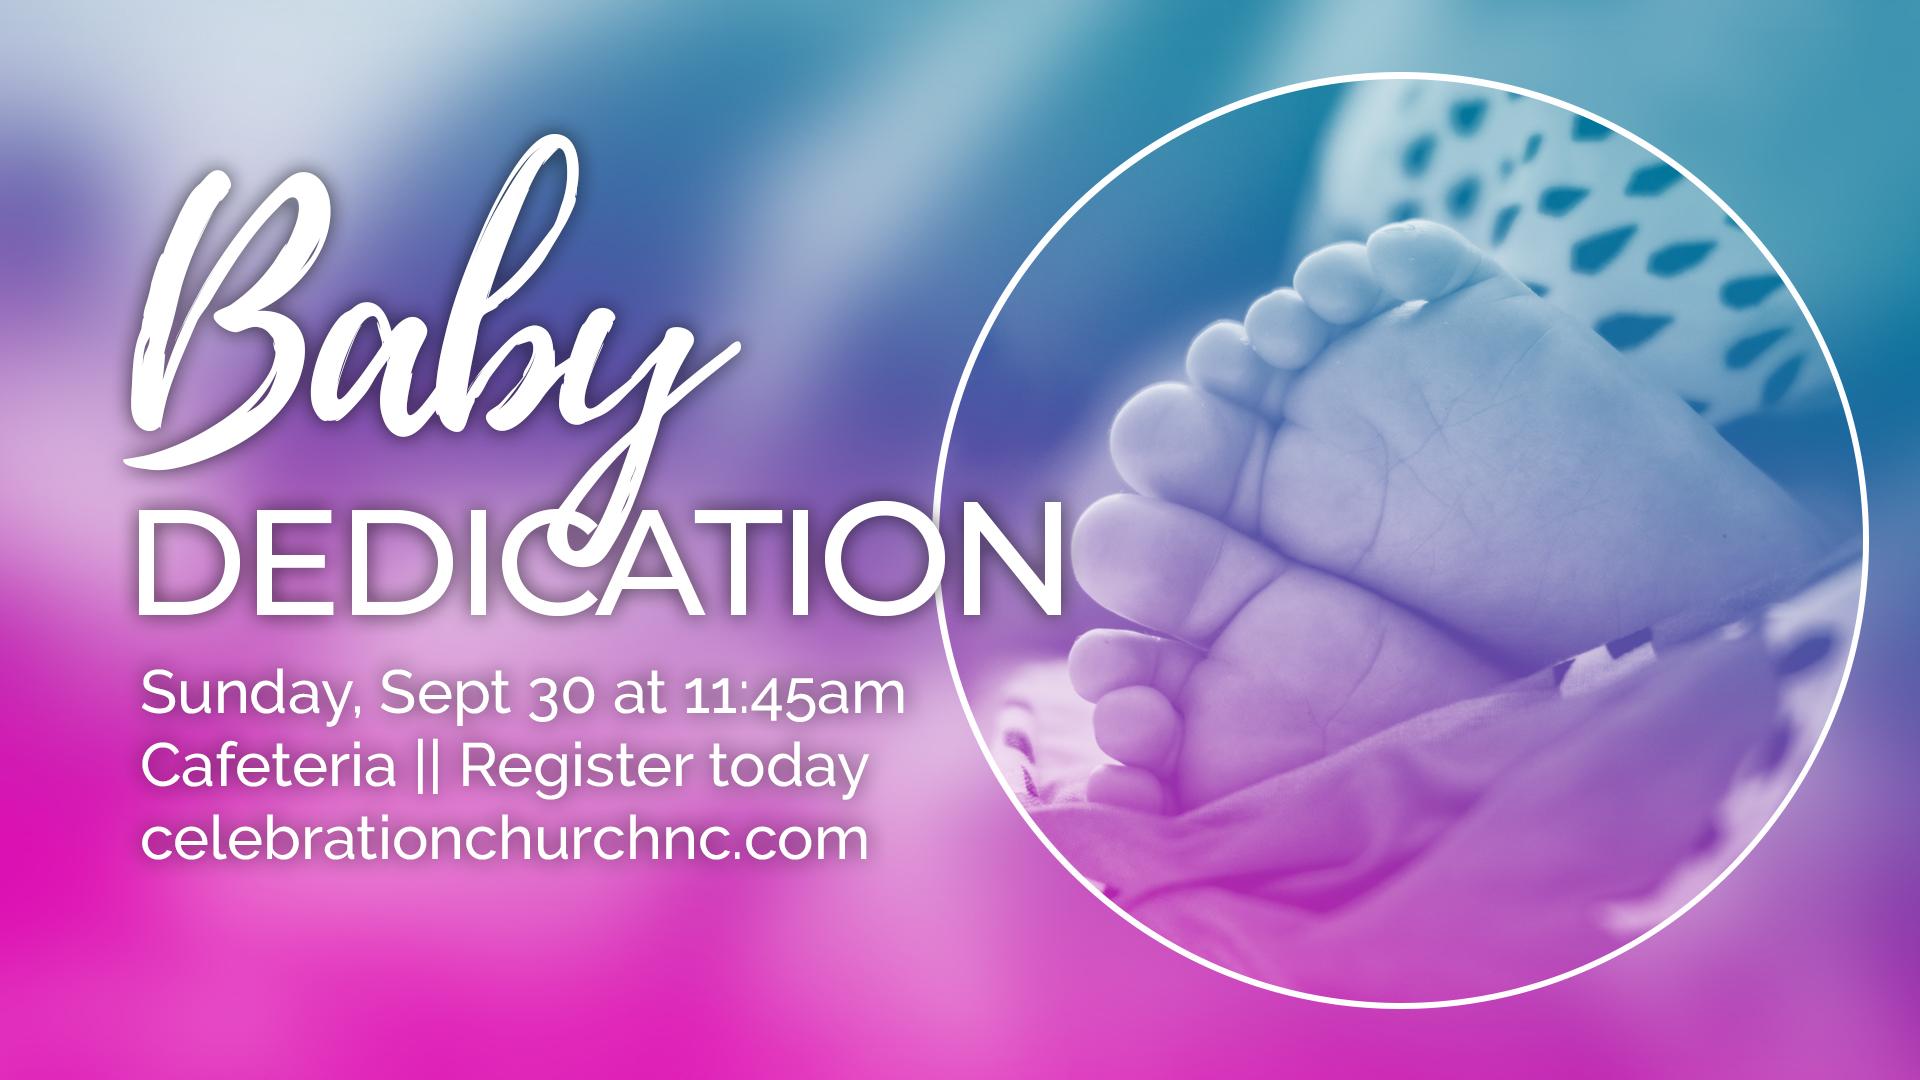 Baby Dedication Announcement Slide 1920x1080 1